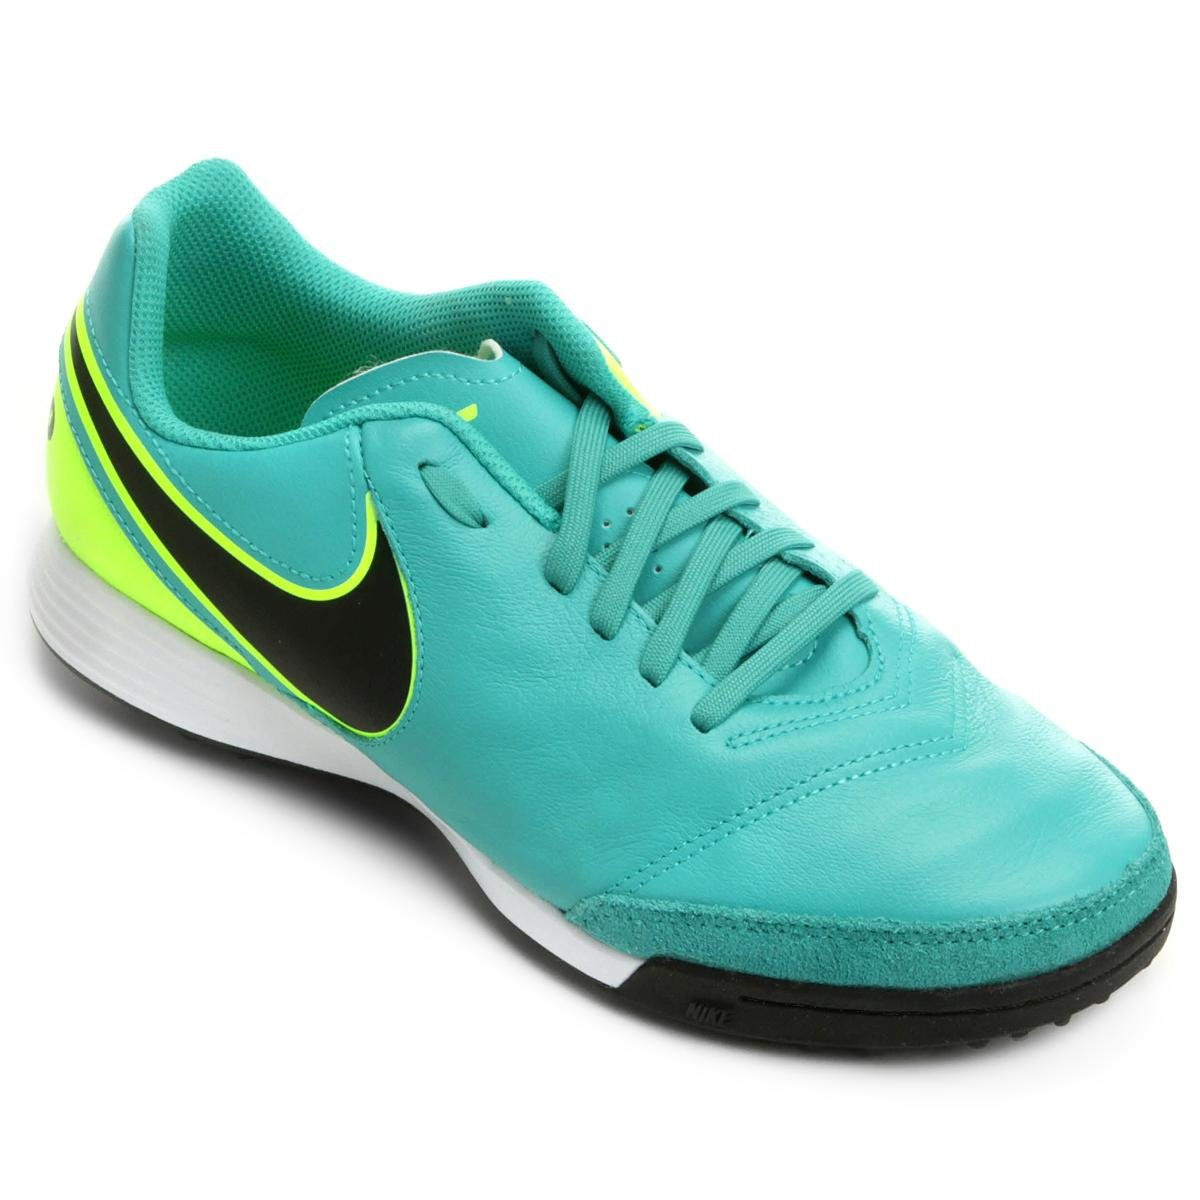 52fb1fbcce Chuteira Society Nike Tiempo Genio 2 Leather TF - Verde água ...